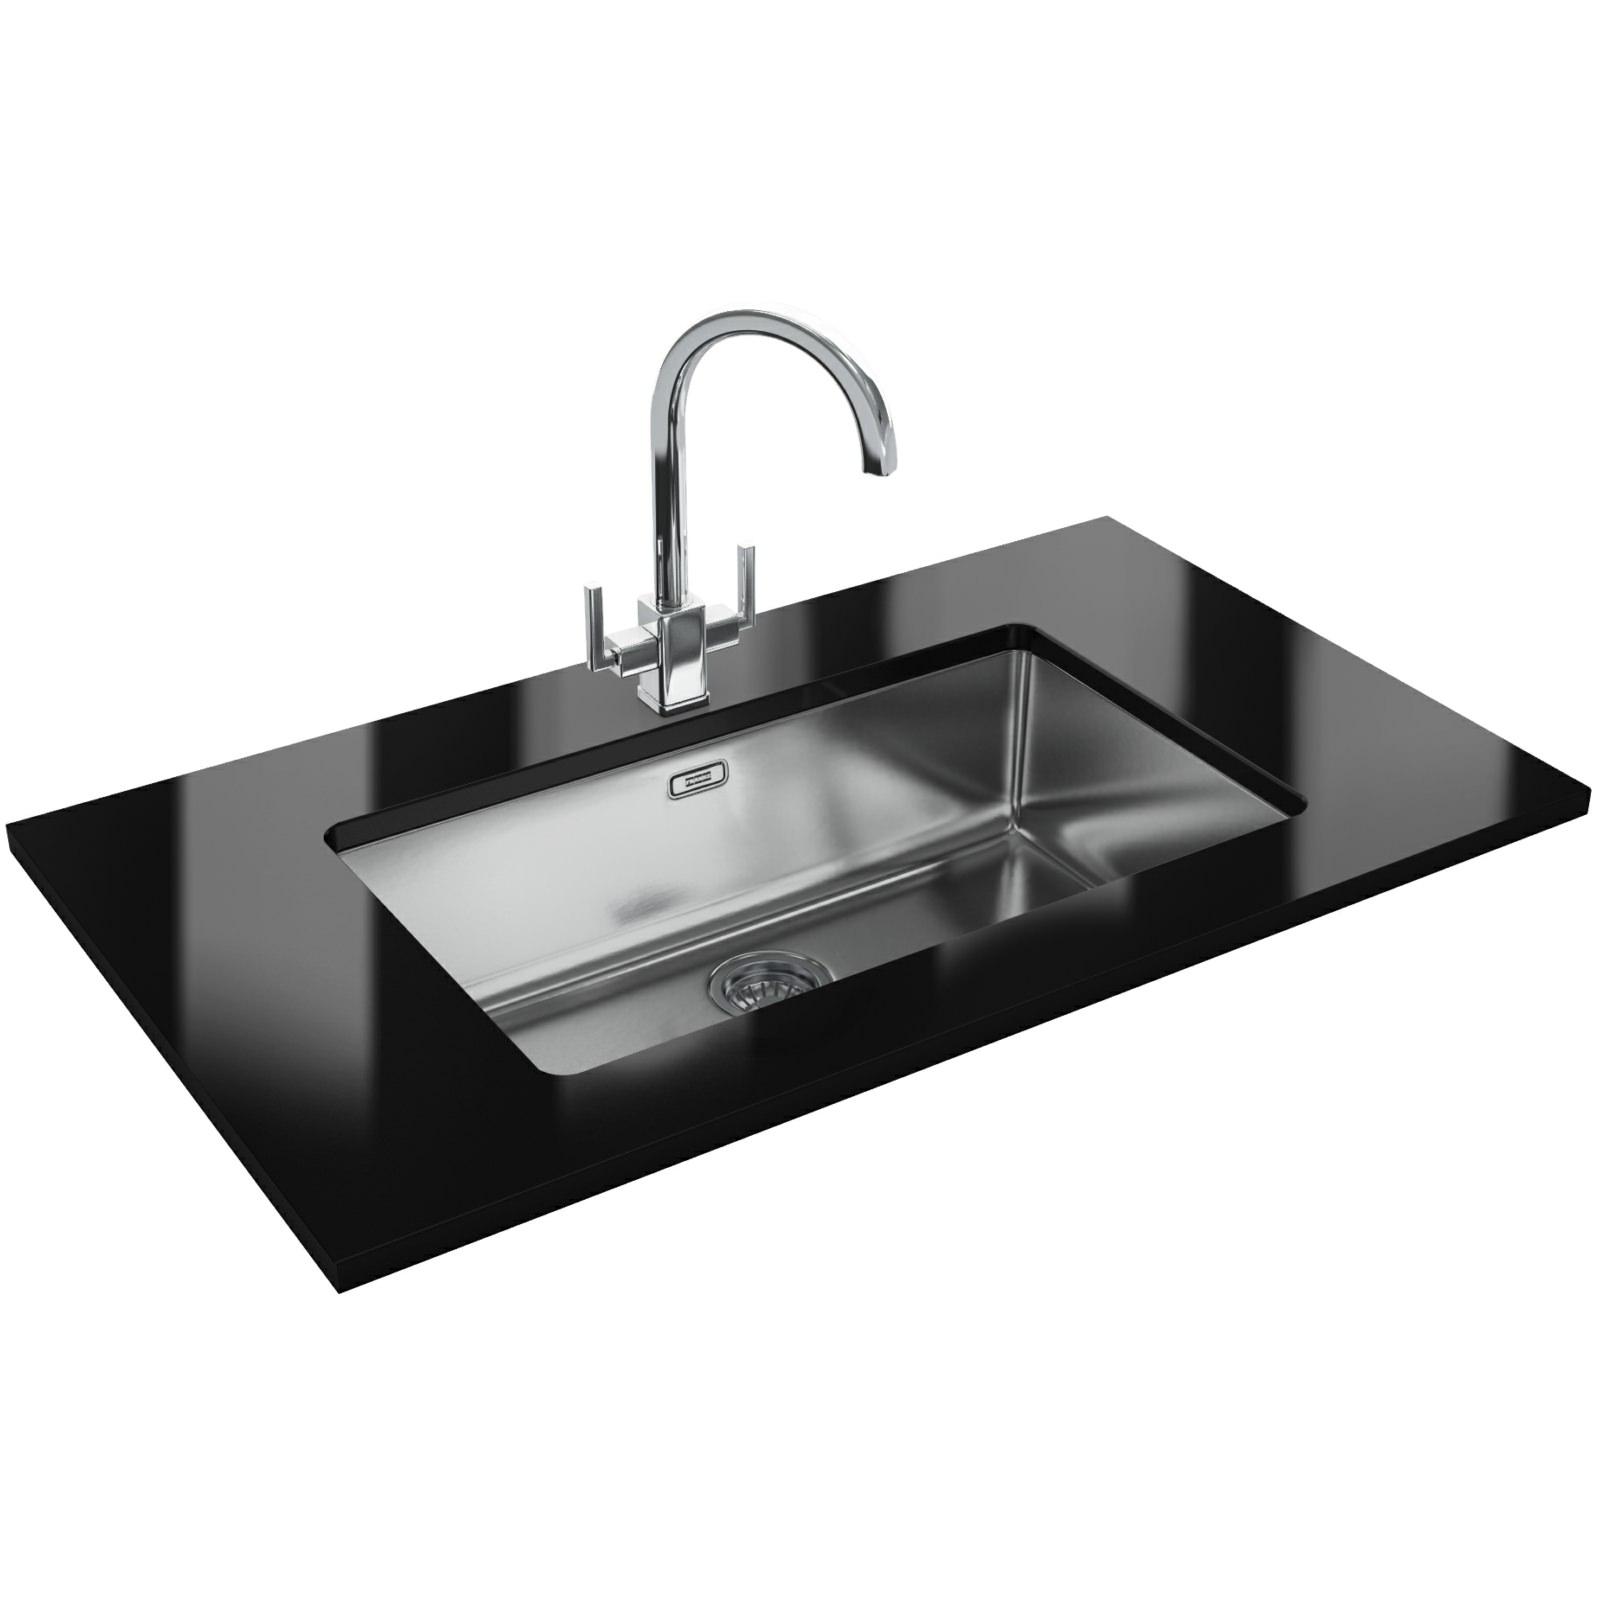 astini celso 15 bowl black glass kitchen sink asblkr astini designer kitchen sinks Franke Kubus Designer Pack Kbx 70 Stainless Steel Kitchen Sink